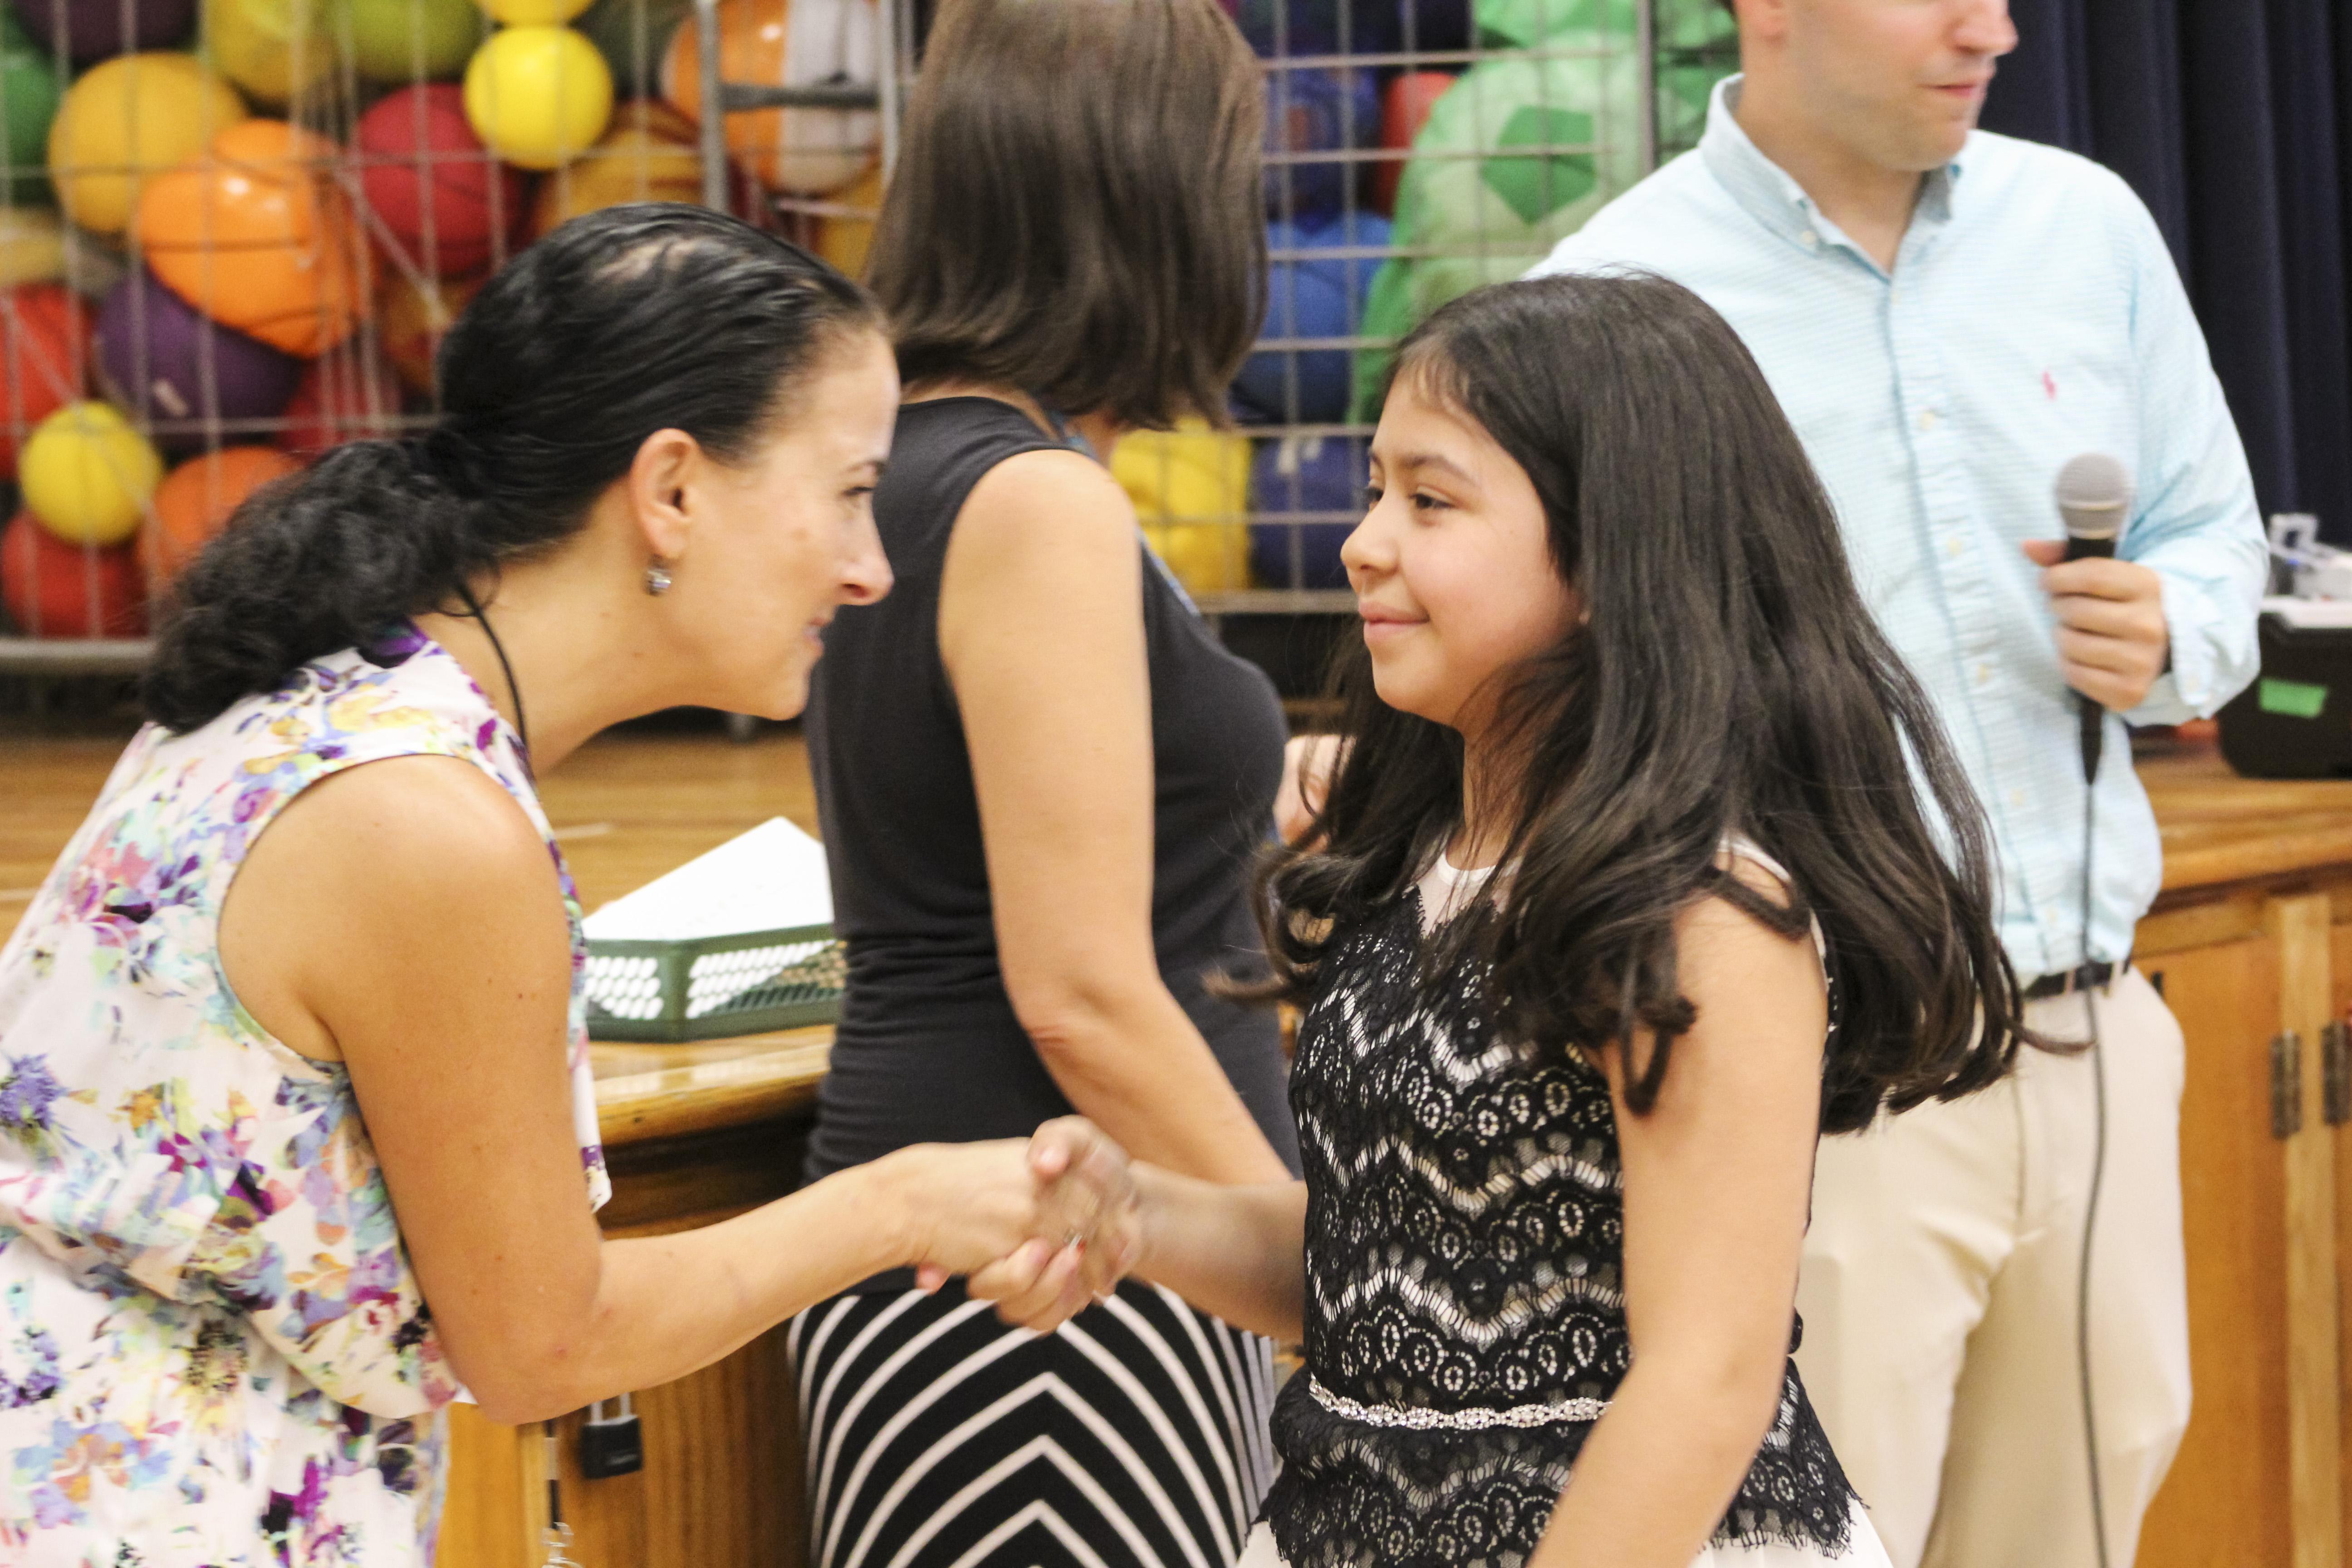 Student shaking principal's hand